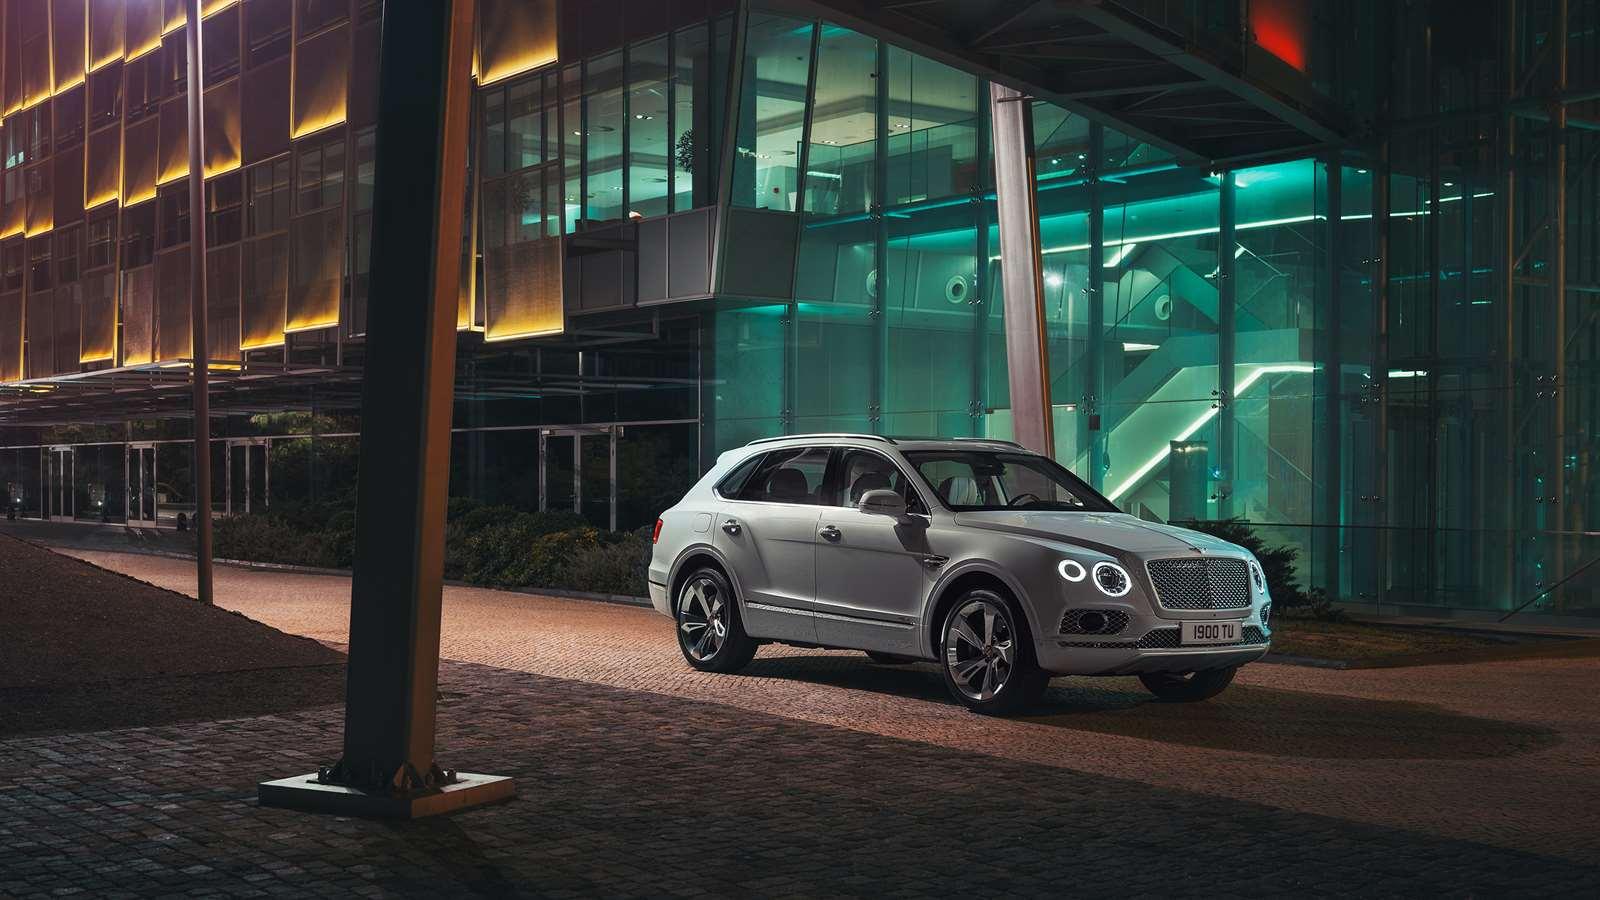 2019 Bentley Bentayga Plug-in Hybrid: Design, Powertrain >> 2019 Bentley Bentayga Plug In Hybrid Design Powertrain Upcoming